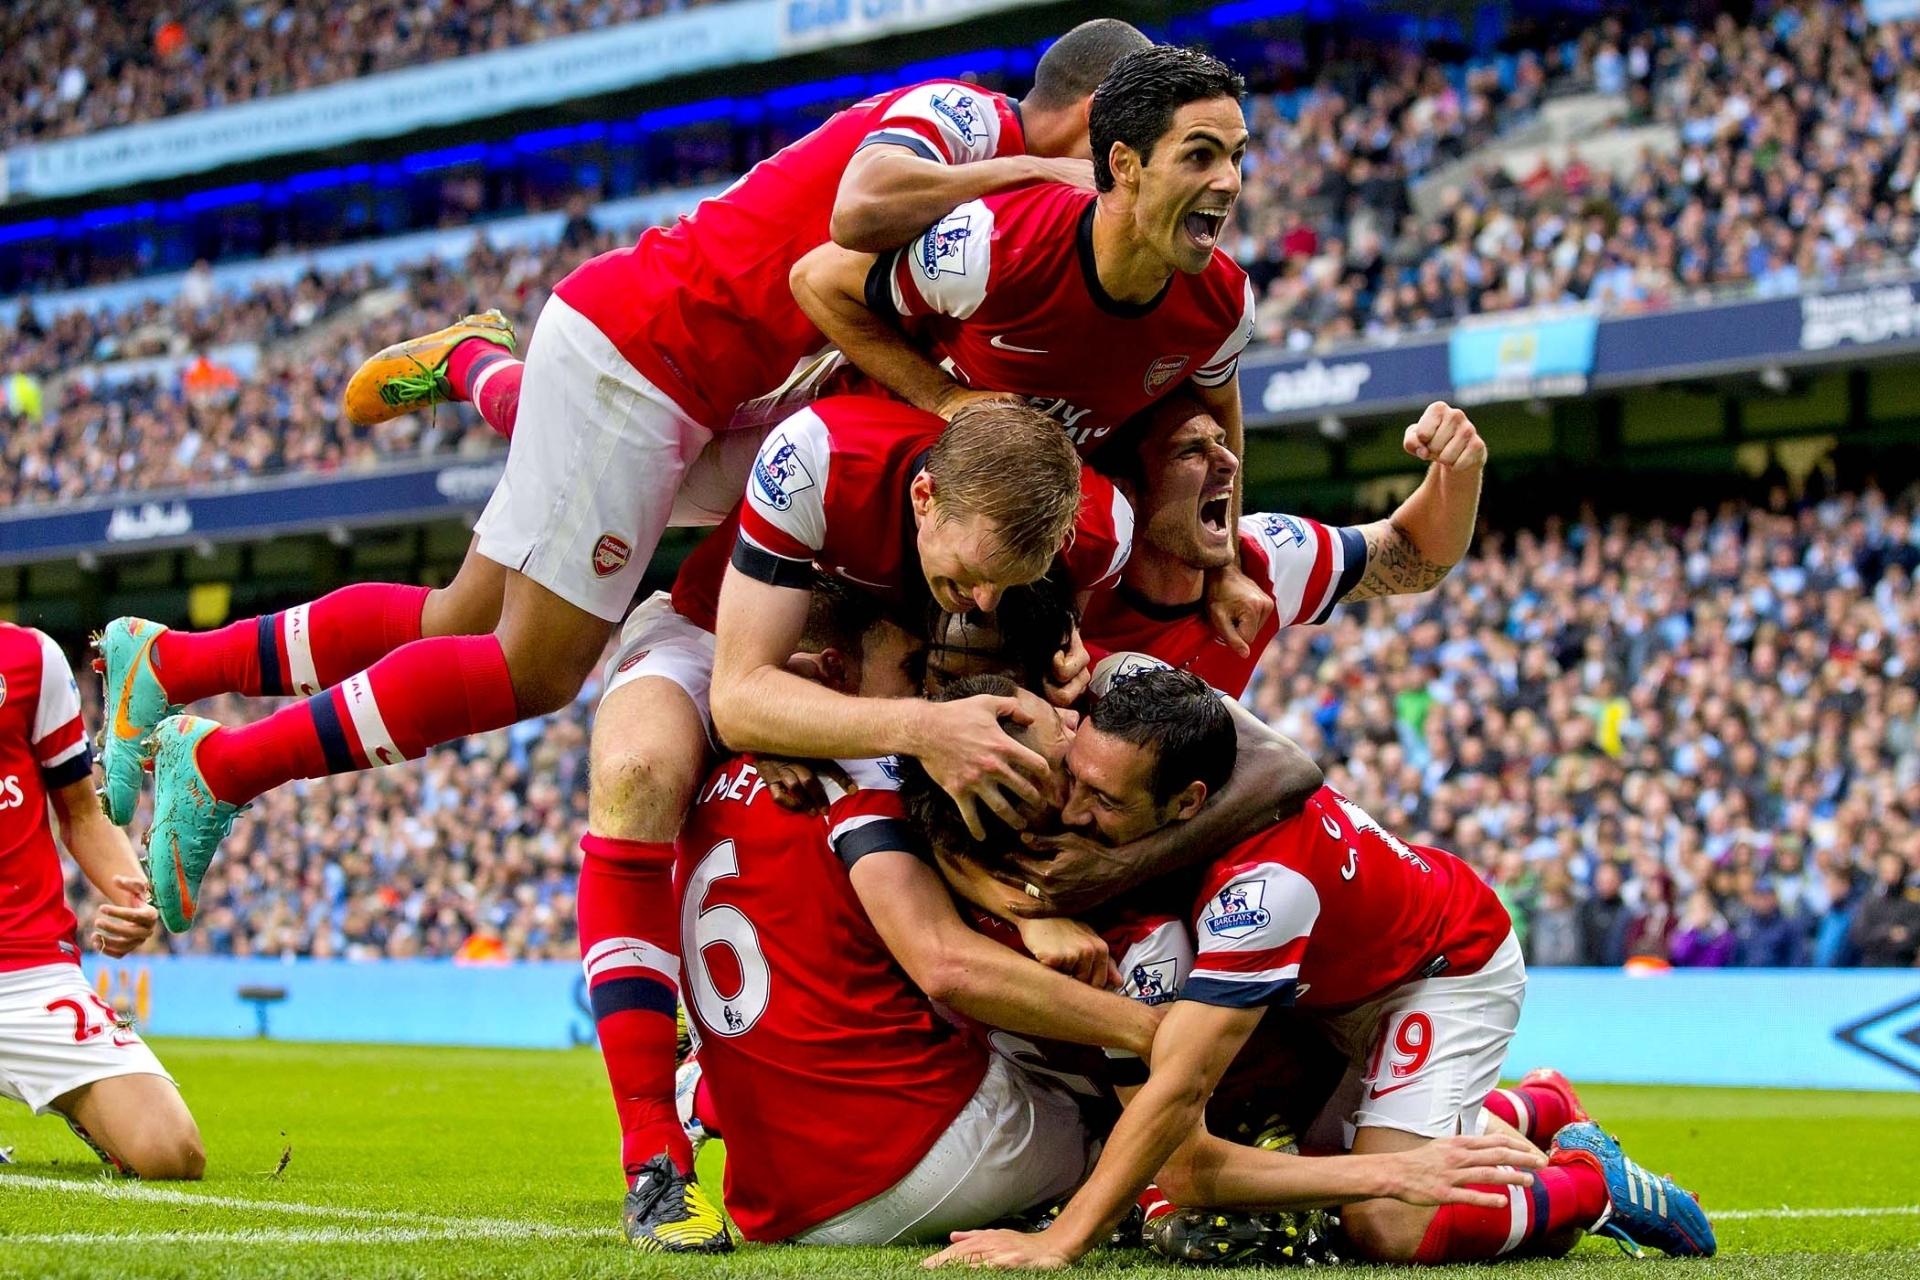 _The_joy_of_victory_Arsenal_086901_.jpg